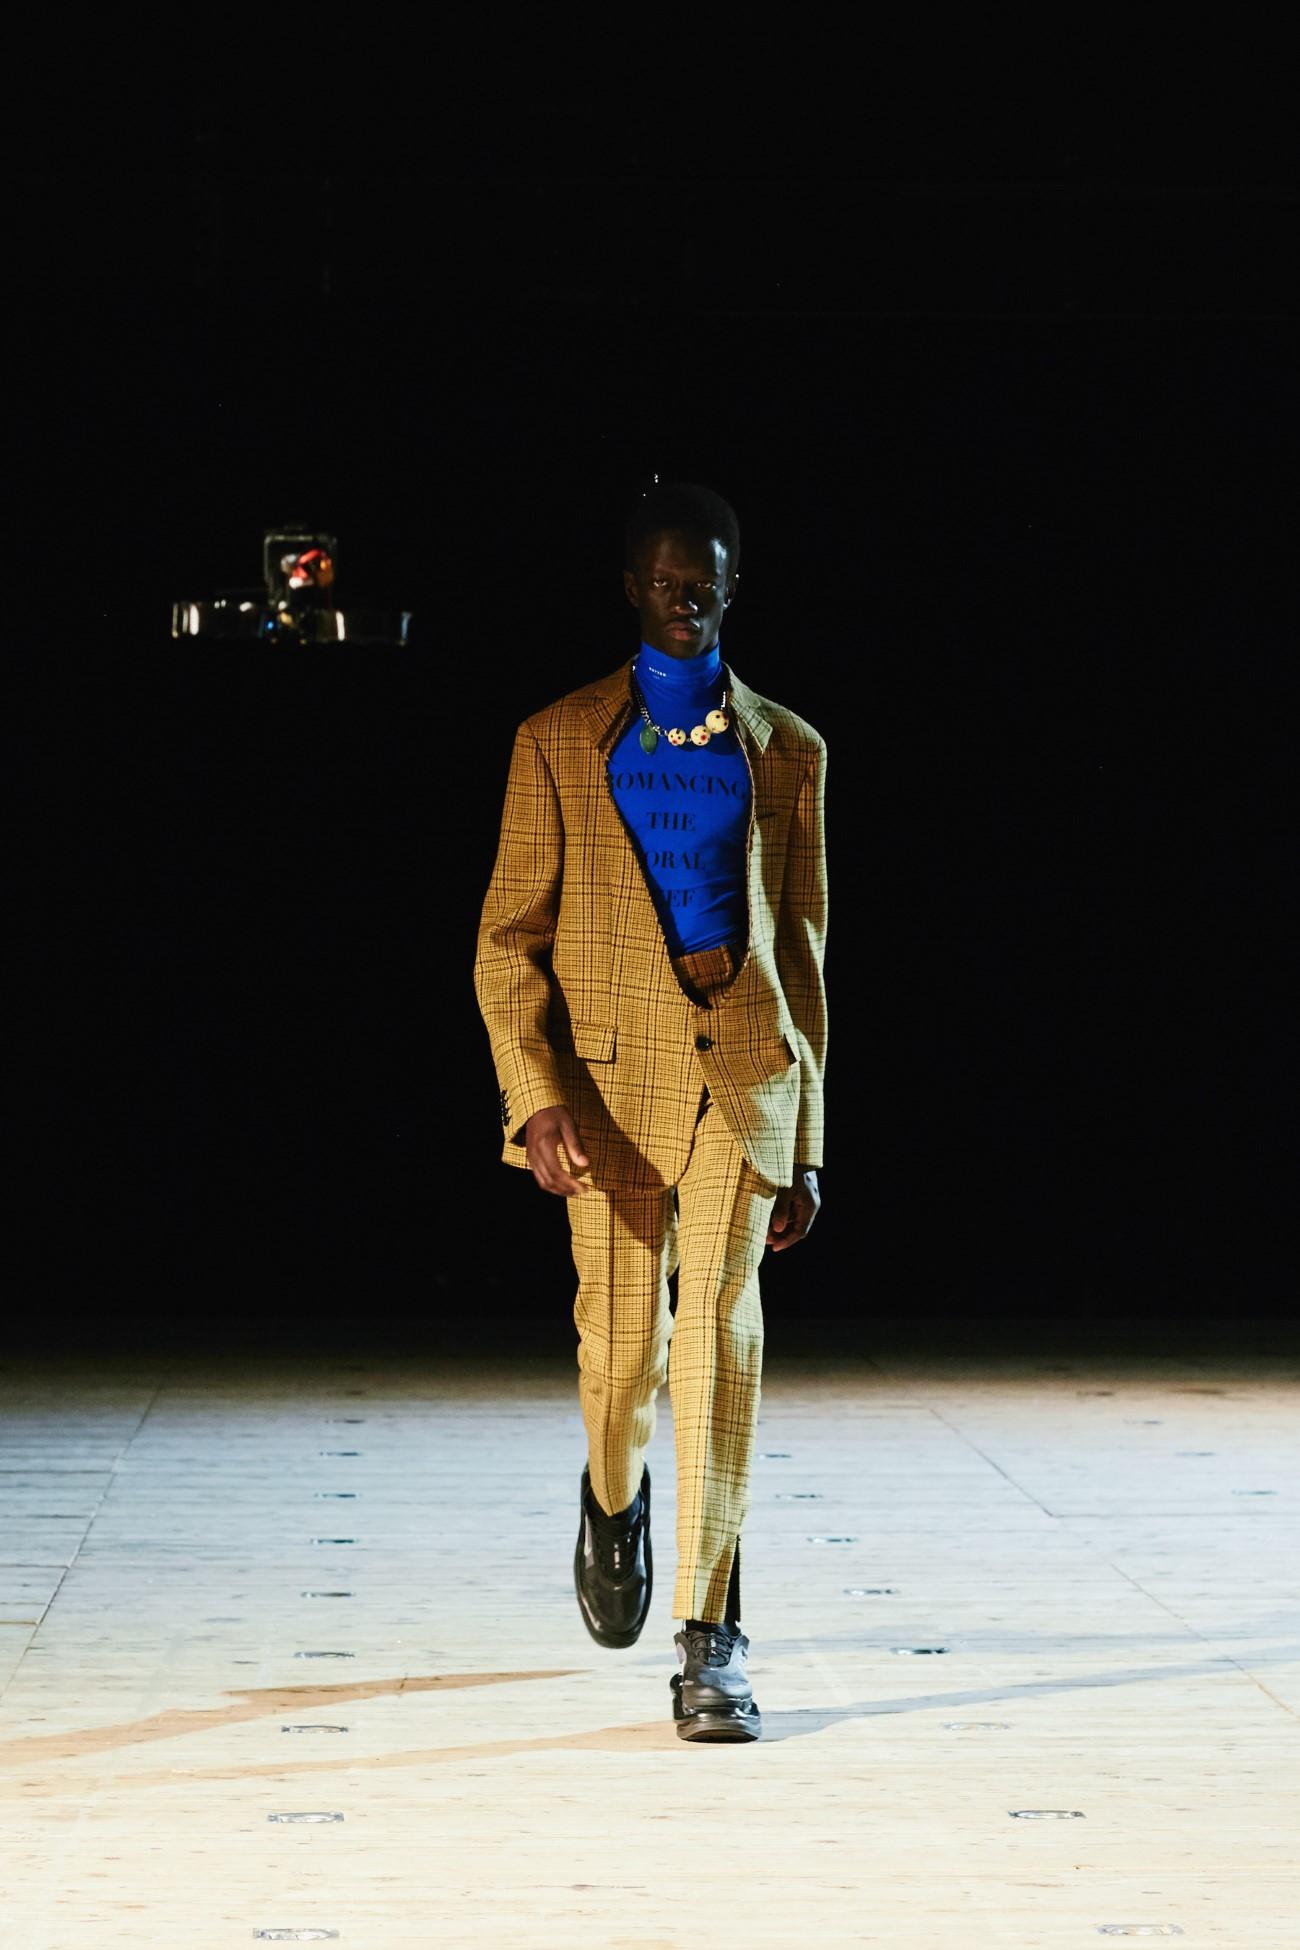 Botter - Automne-Hiver 2021 - Paris Fashion Week